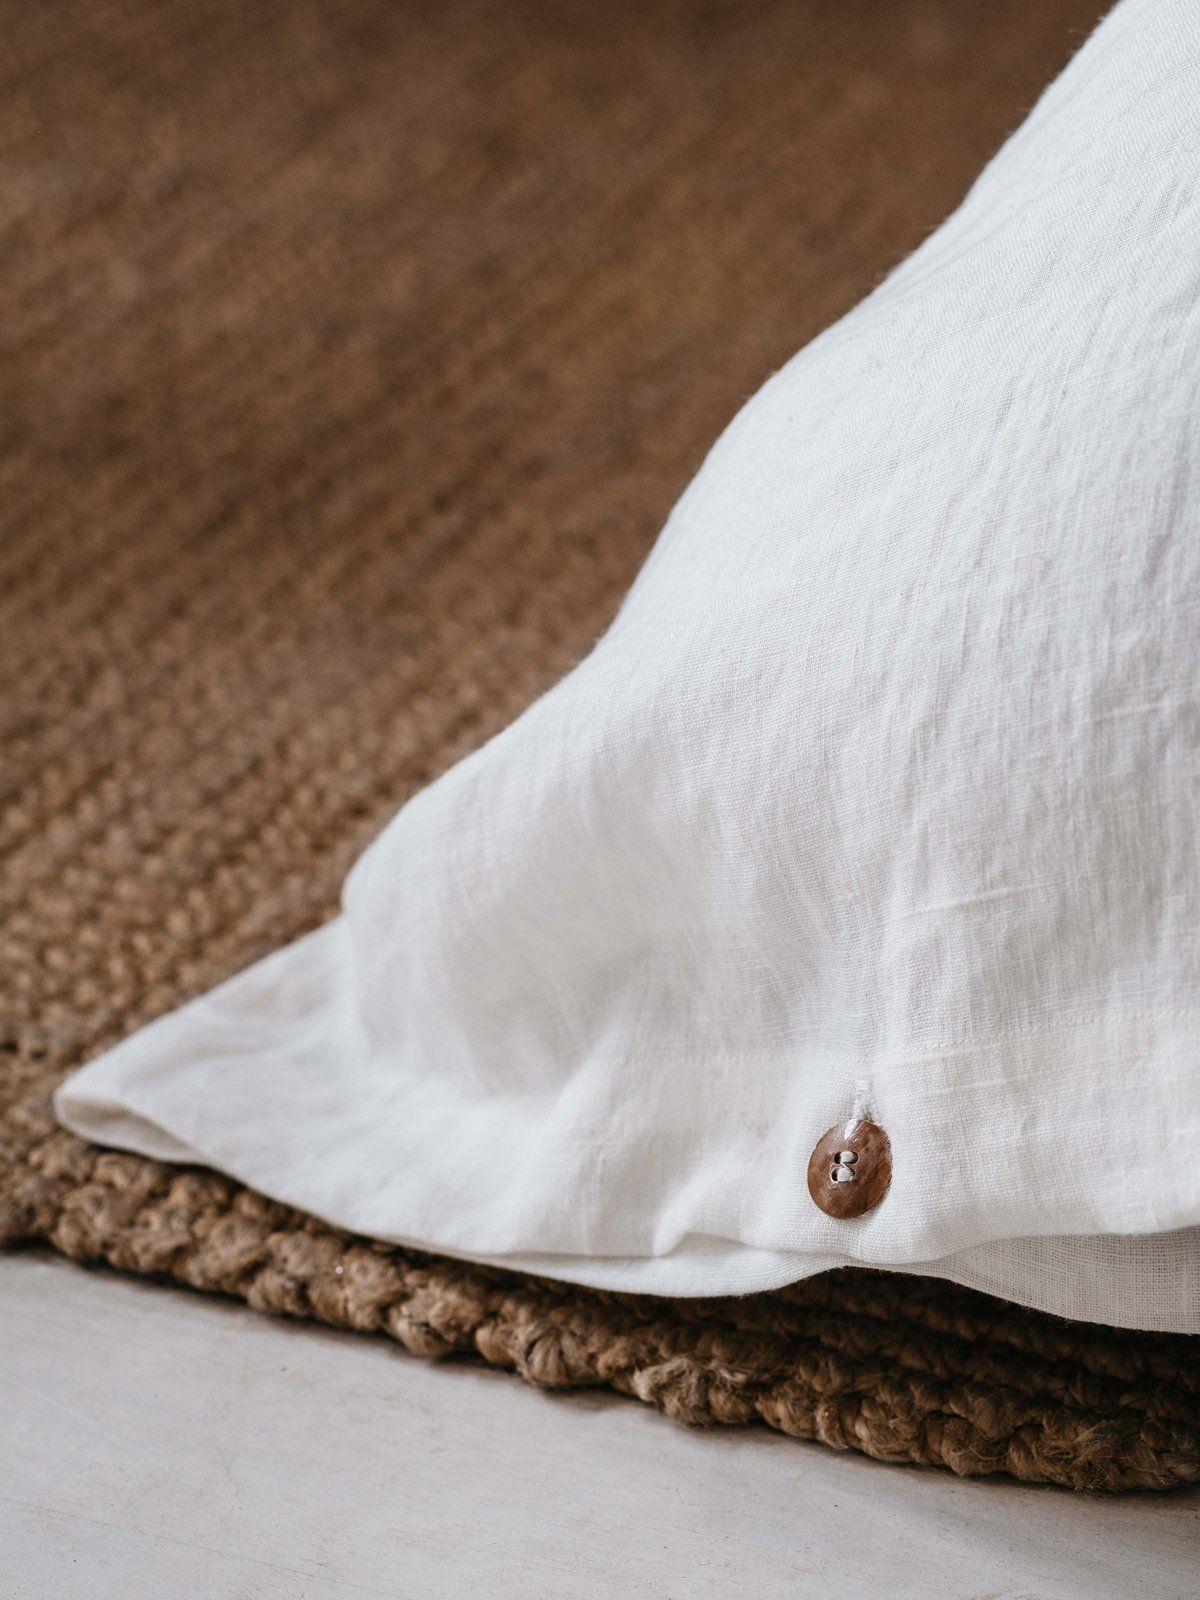 Funda almohada de lino lavado blanco detalle